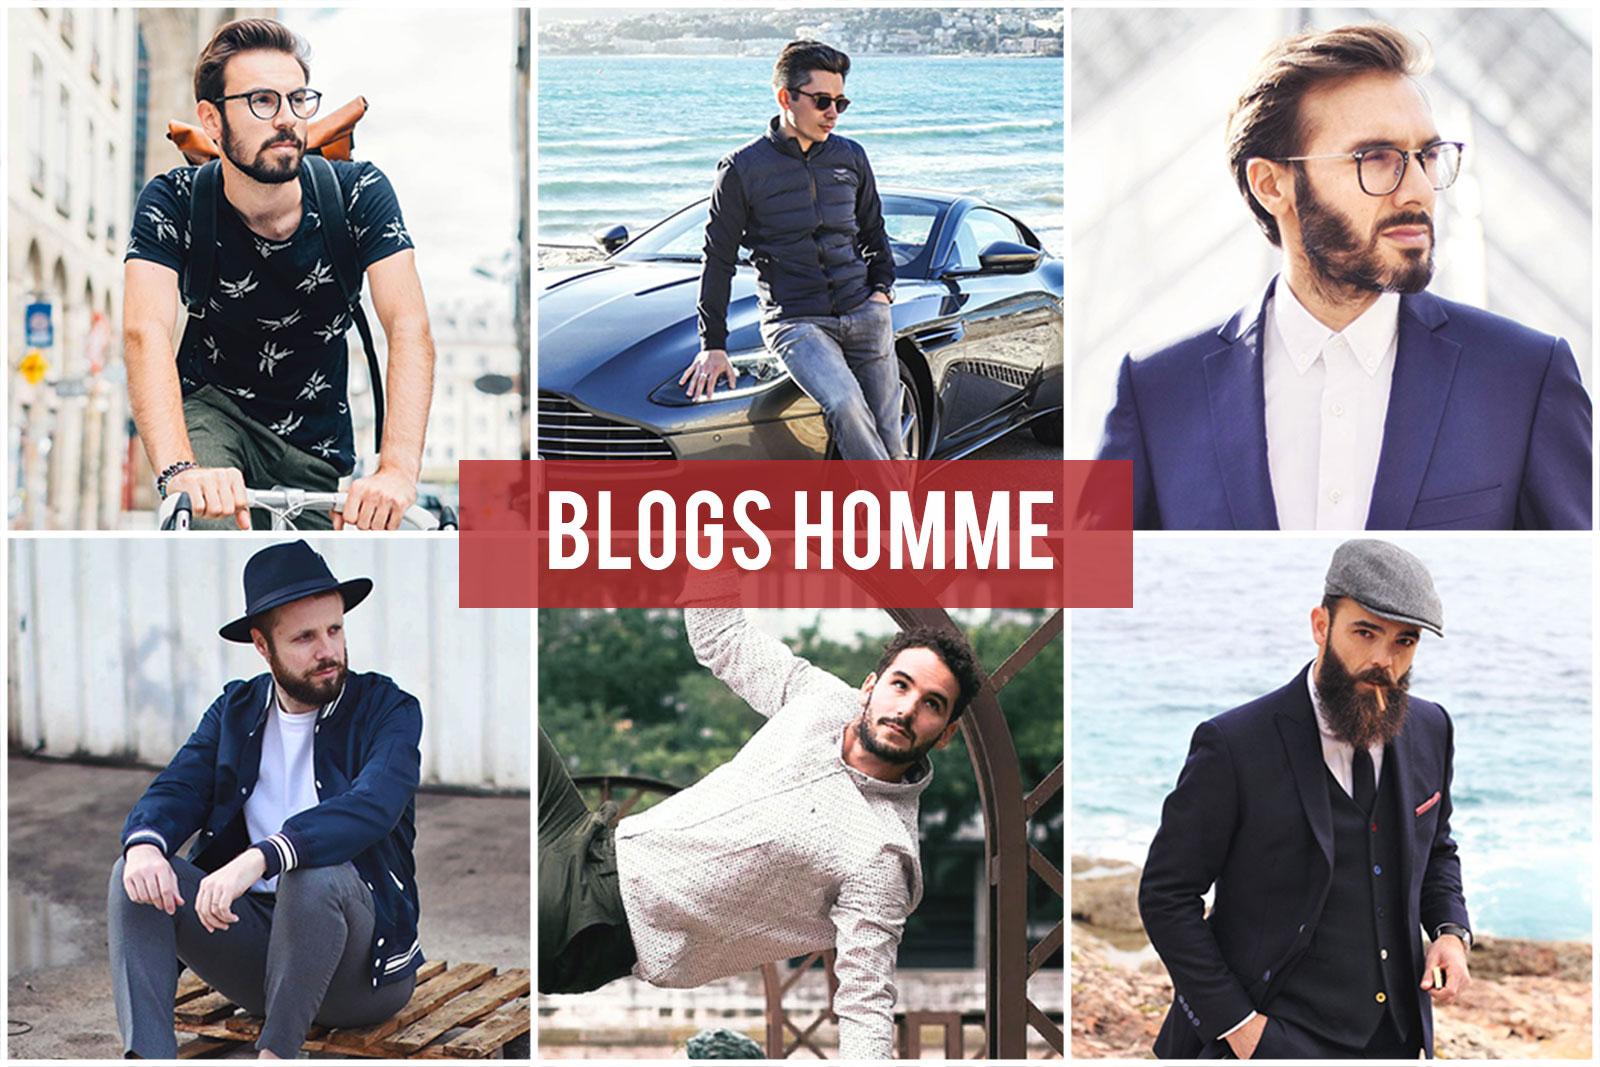 Blogs Homme